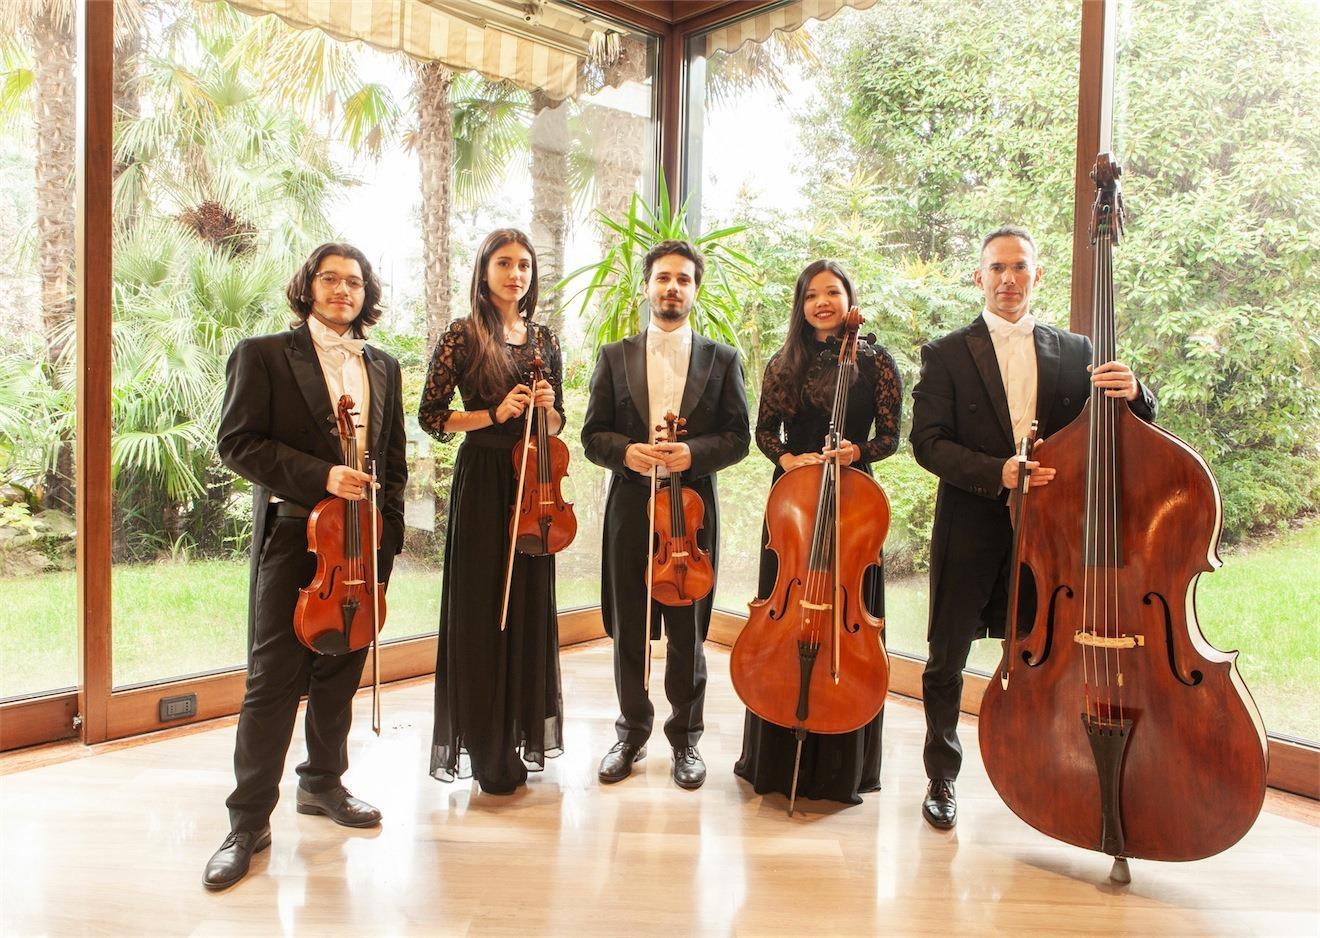 Concerto d'archi a Isola Mantegna